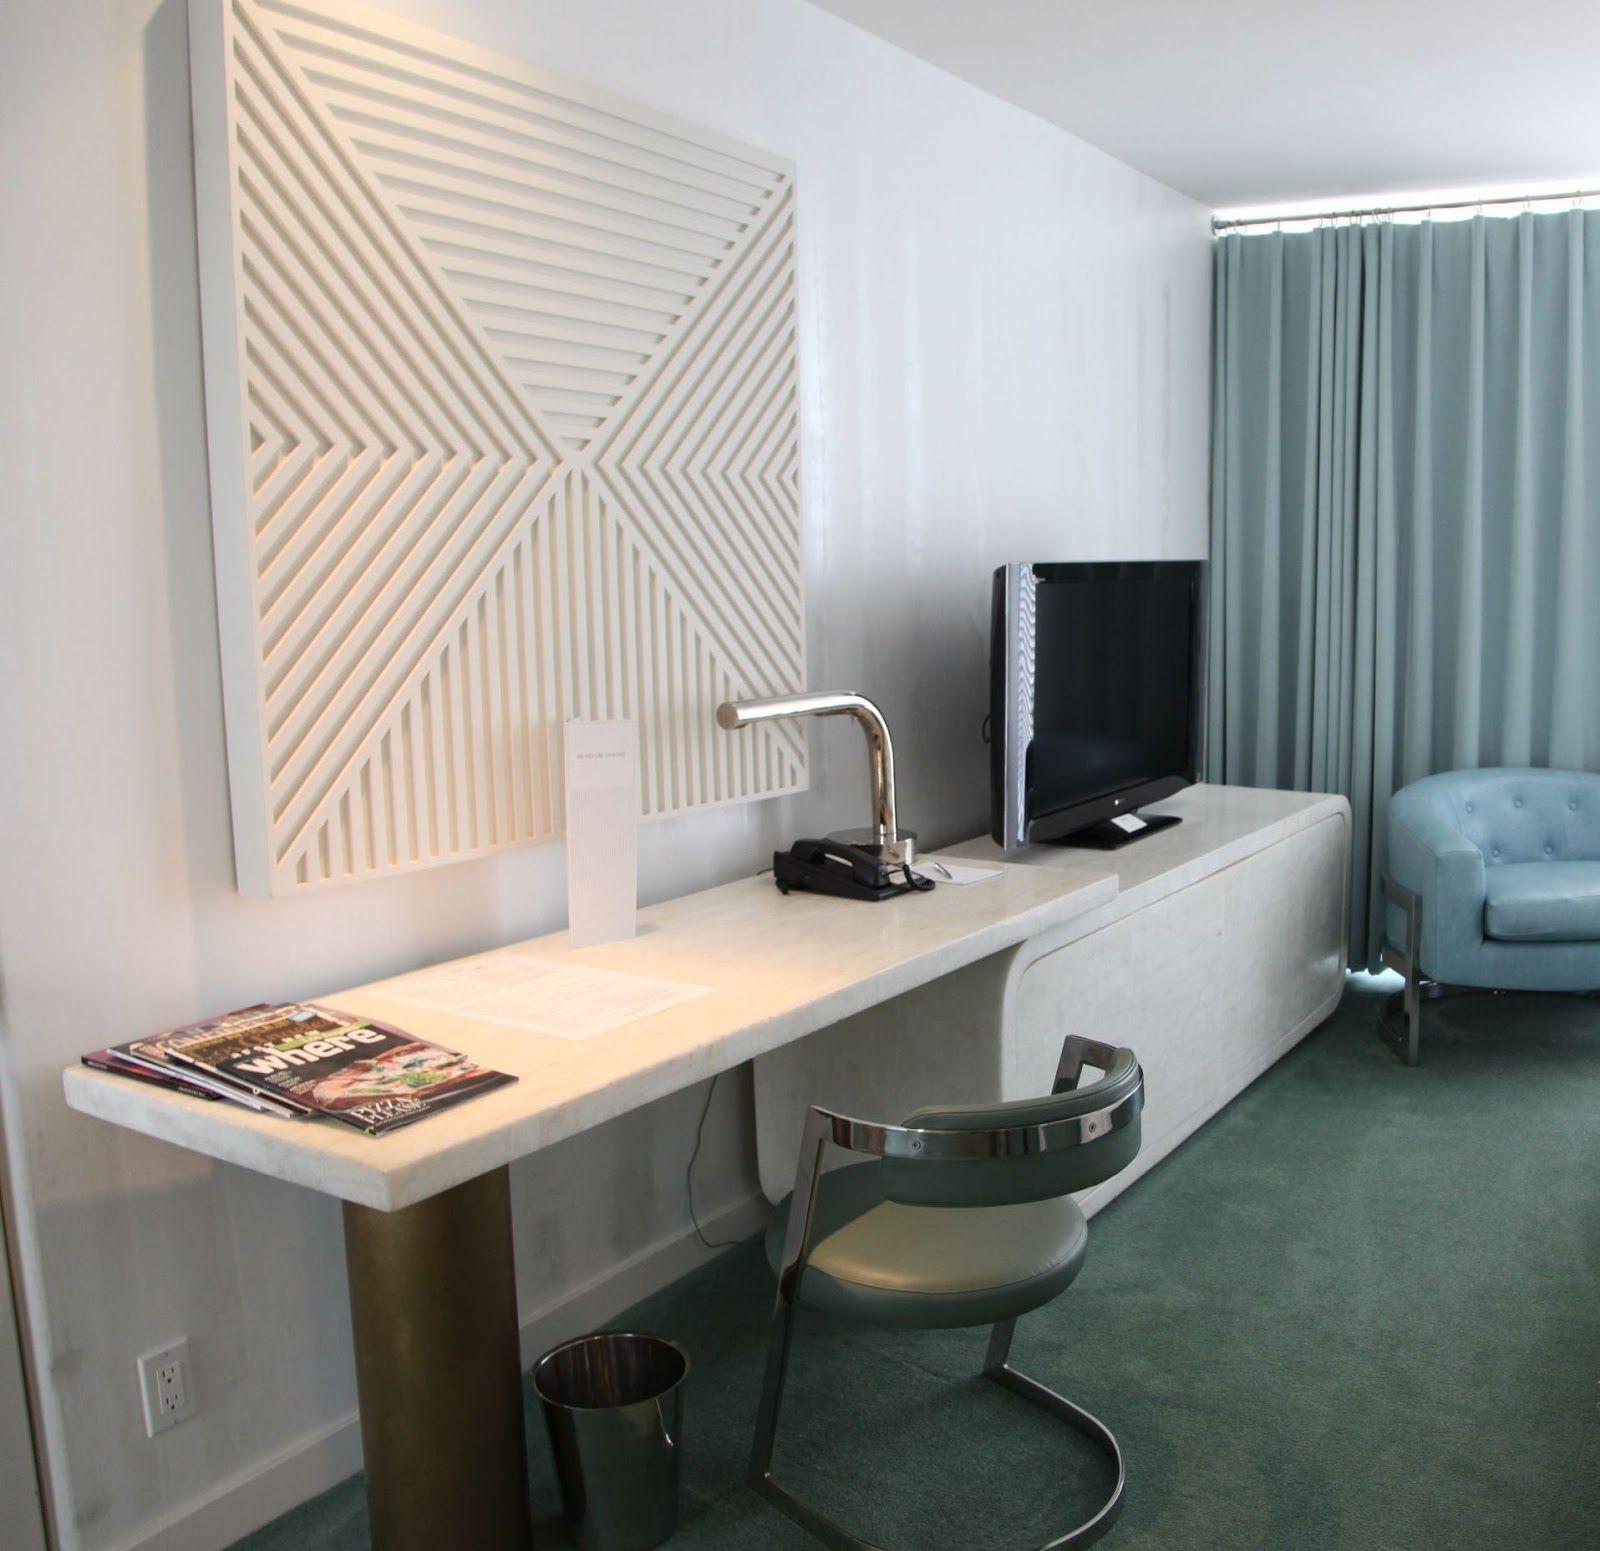 Avalon Hotel Beverly Hills Modern Interiors